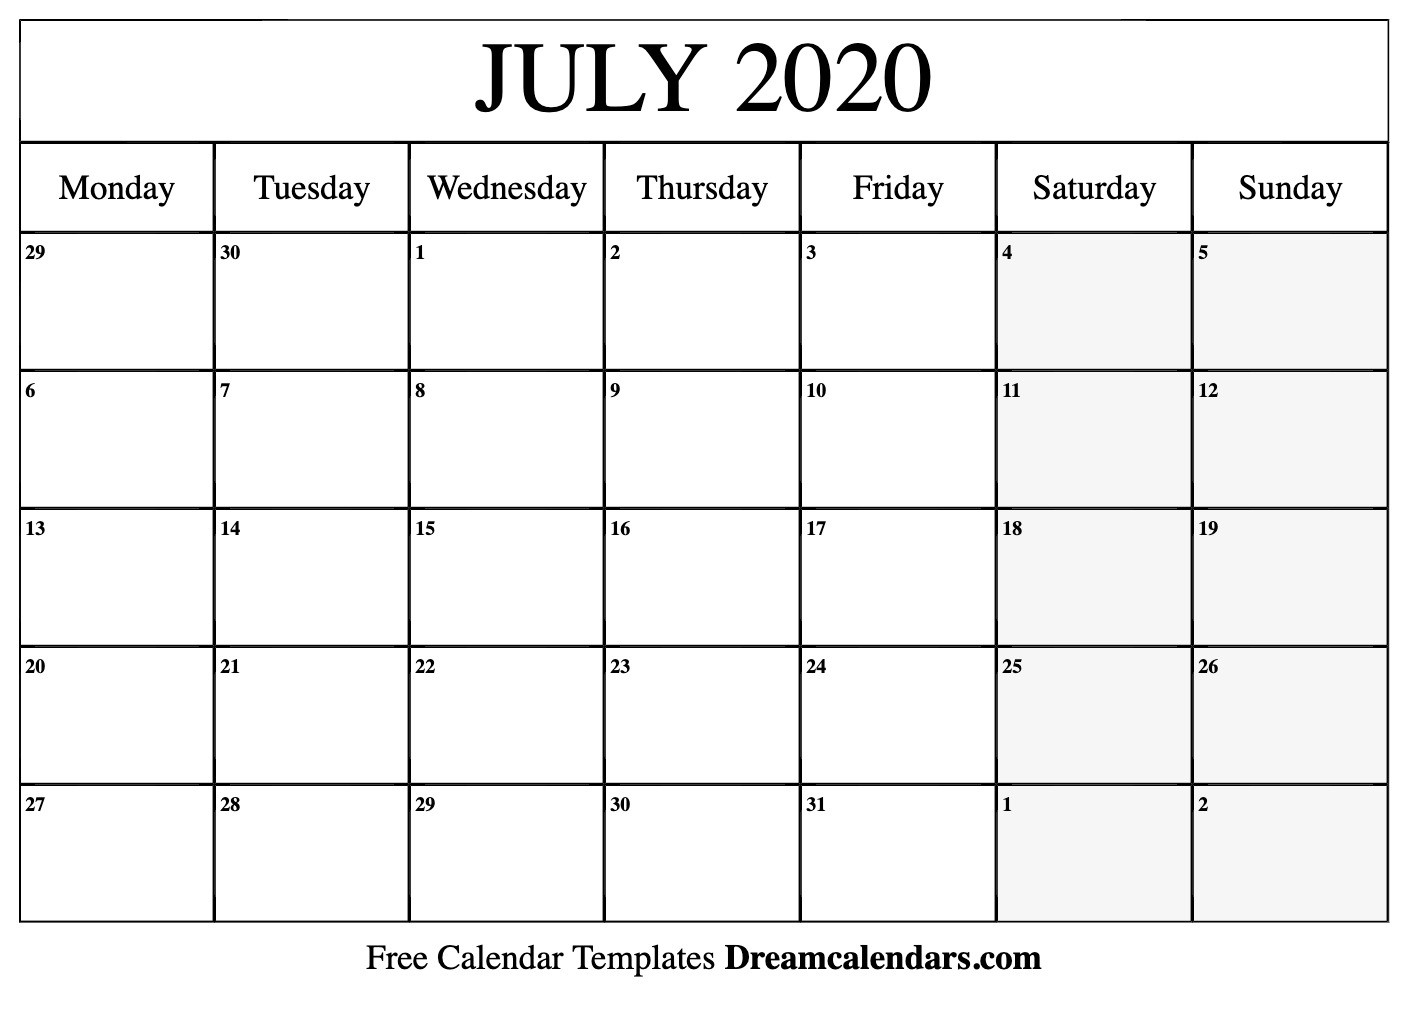 Printable July 2020 Calendar-3 Month Blank Calendar June-August 2020